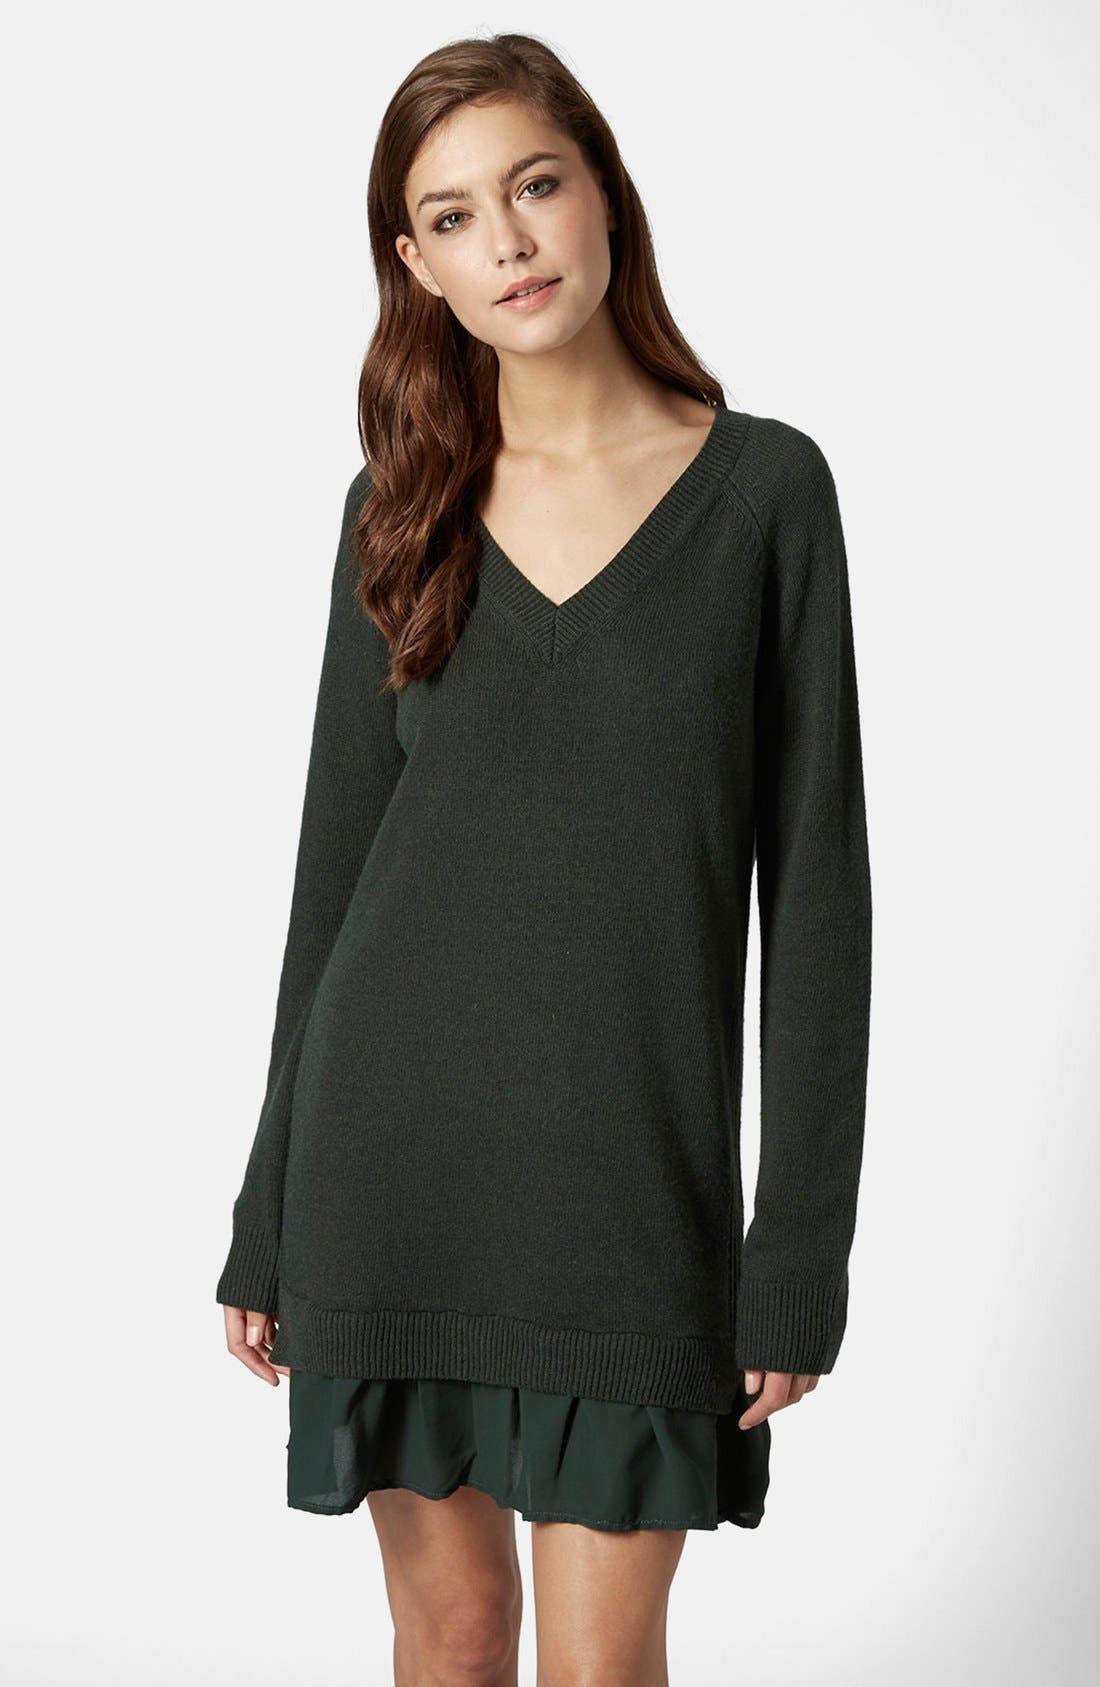 Alternate Image 1 Selected - Topshop Woven Hem V-Neck Sweater Dress